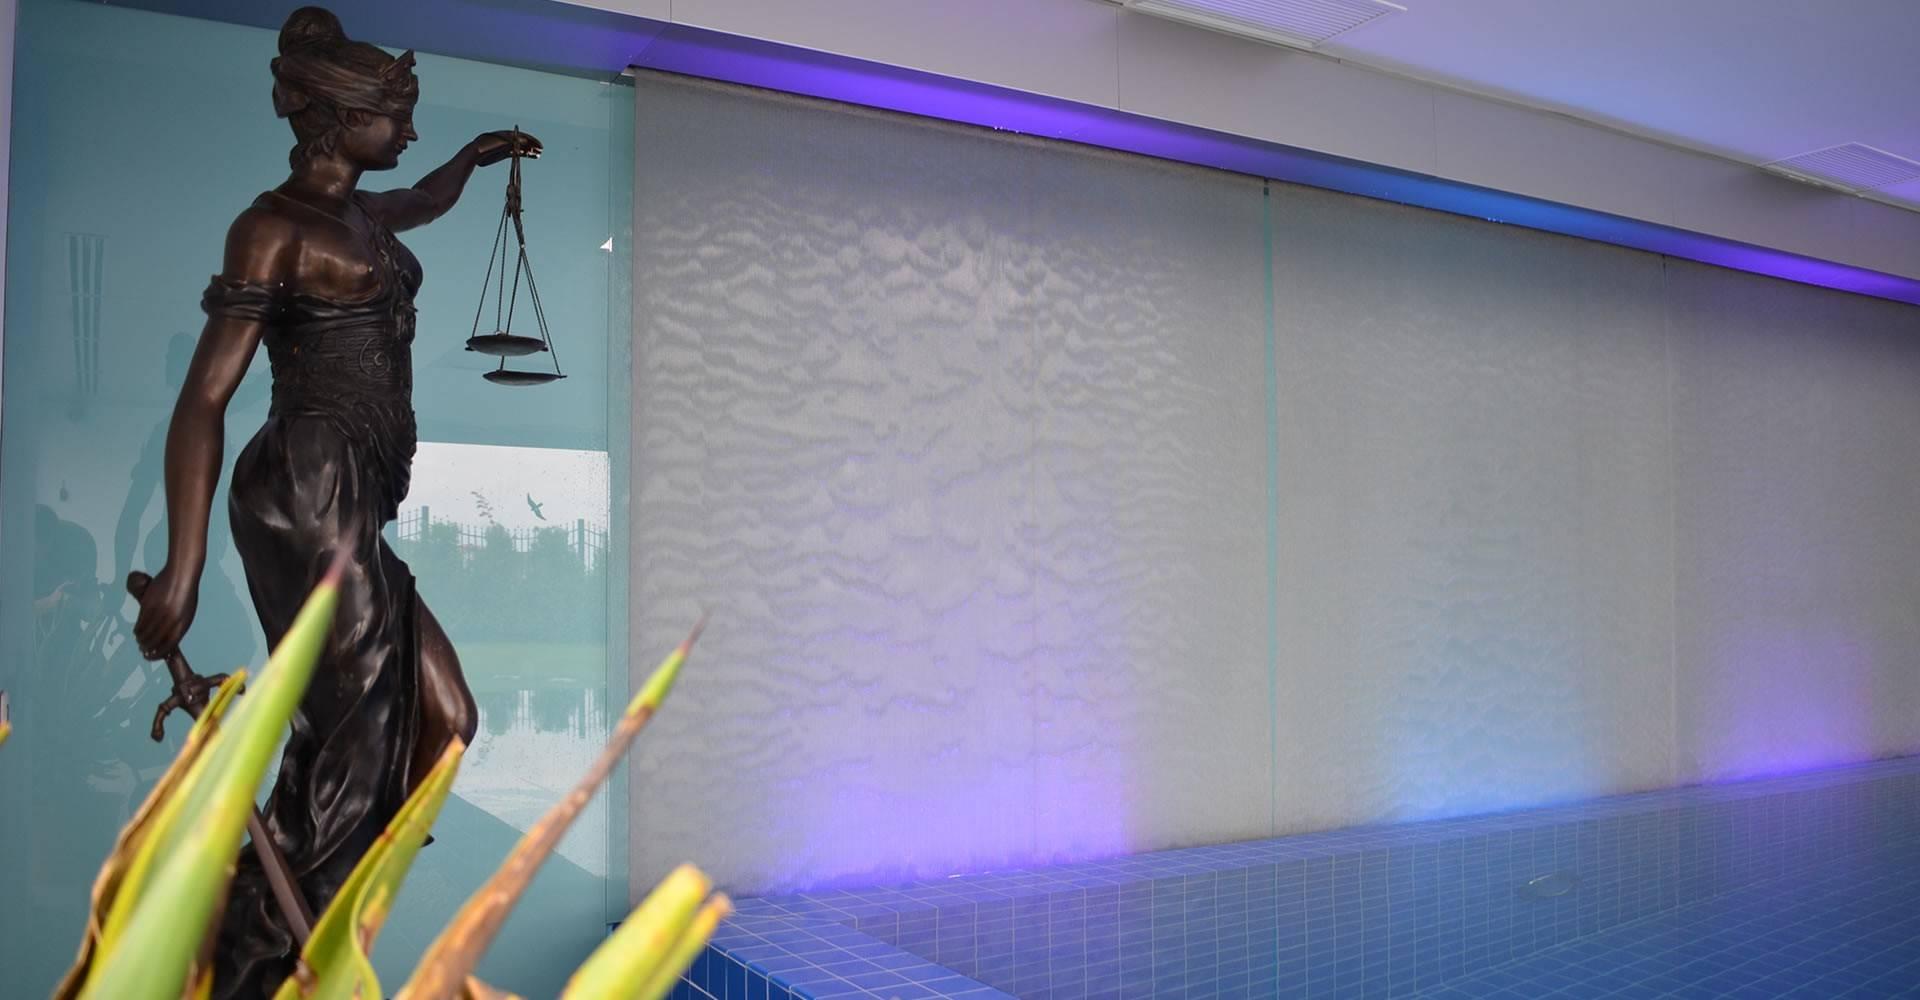 proiect-piscina-04